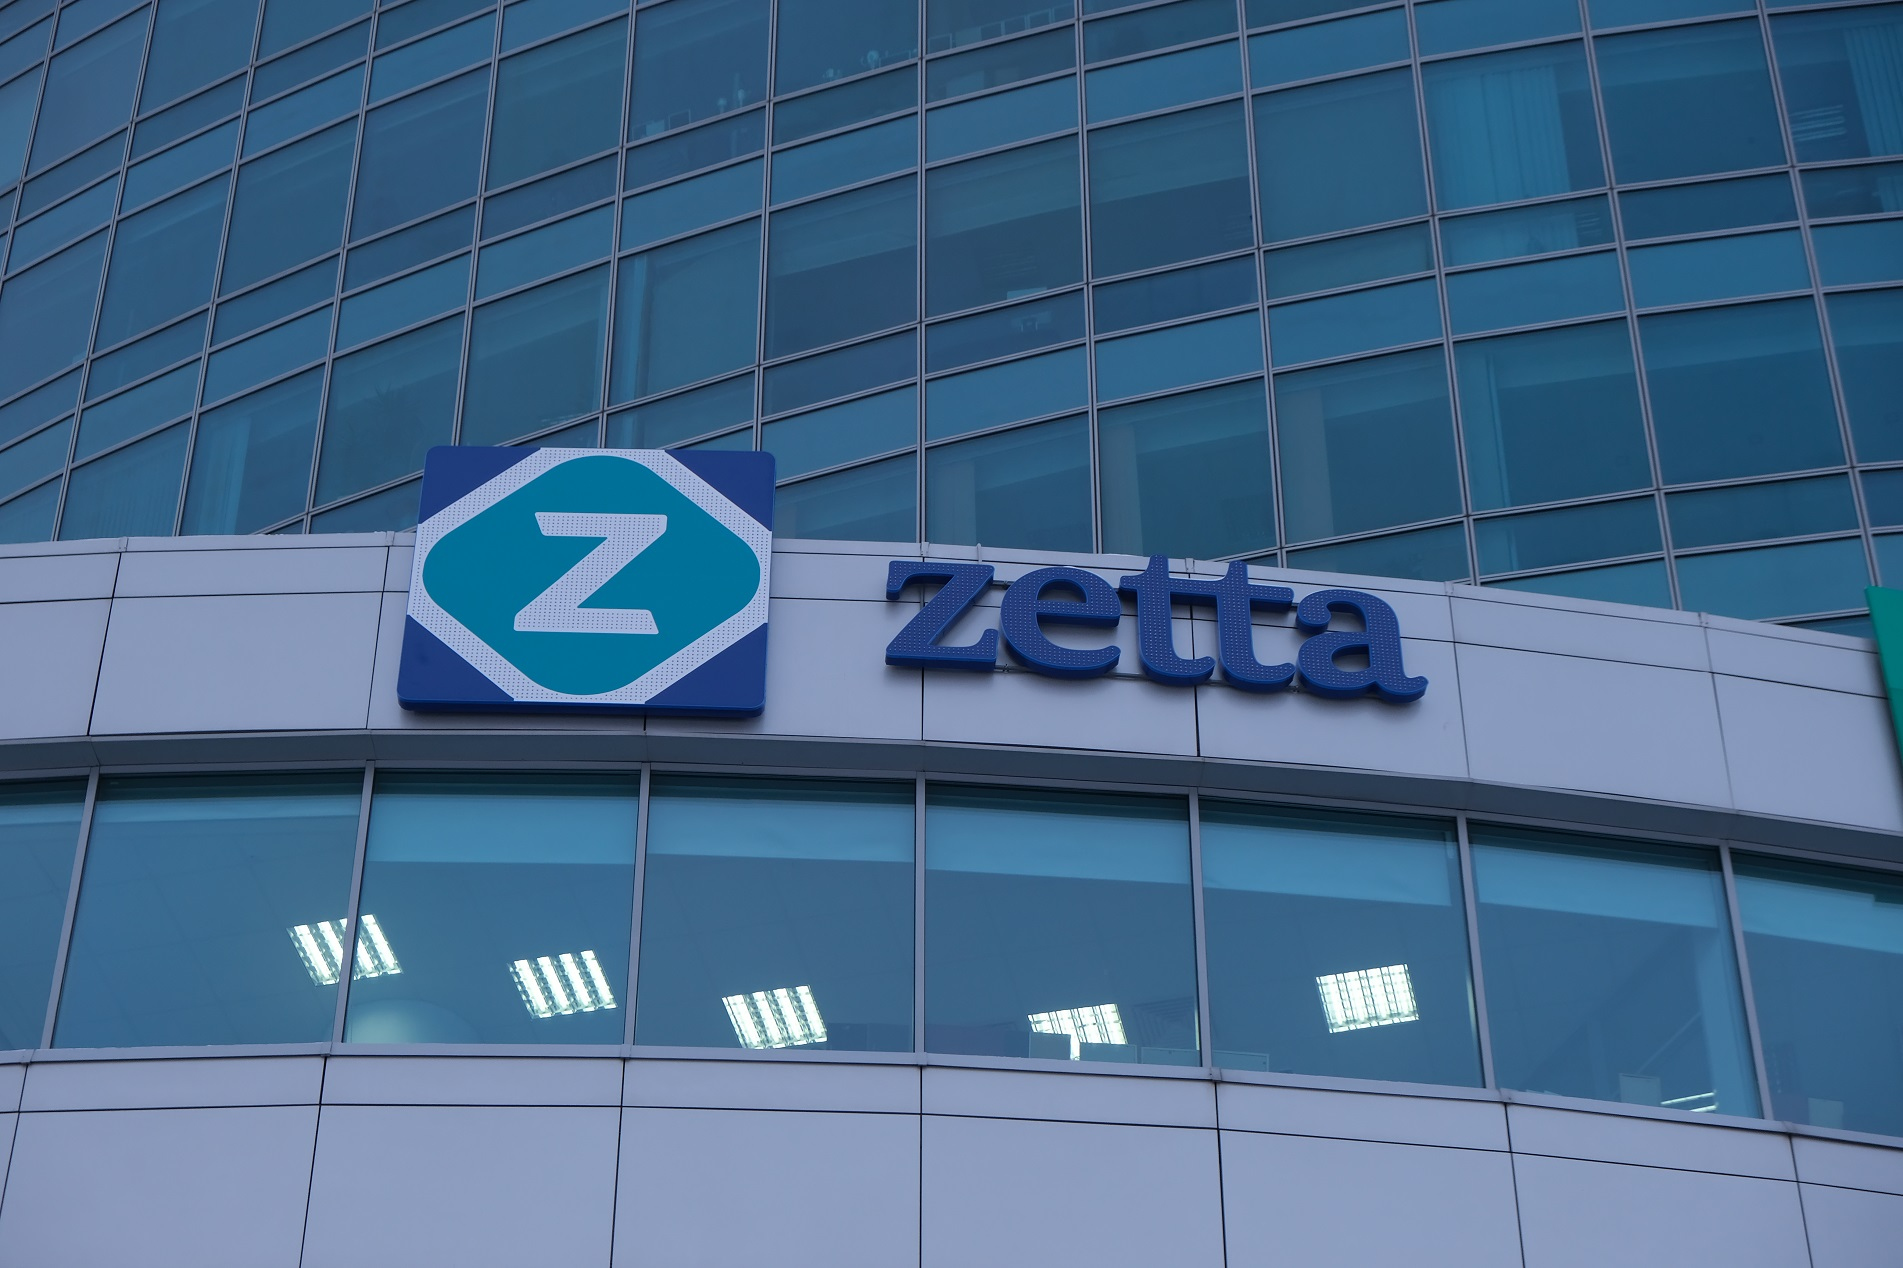 Zetta Insurance Company Ltd